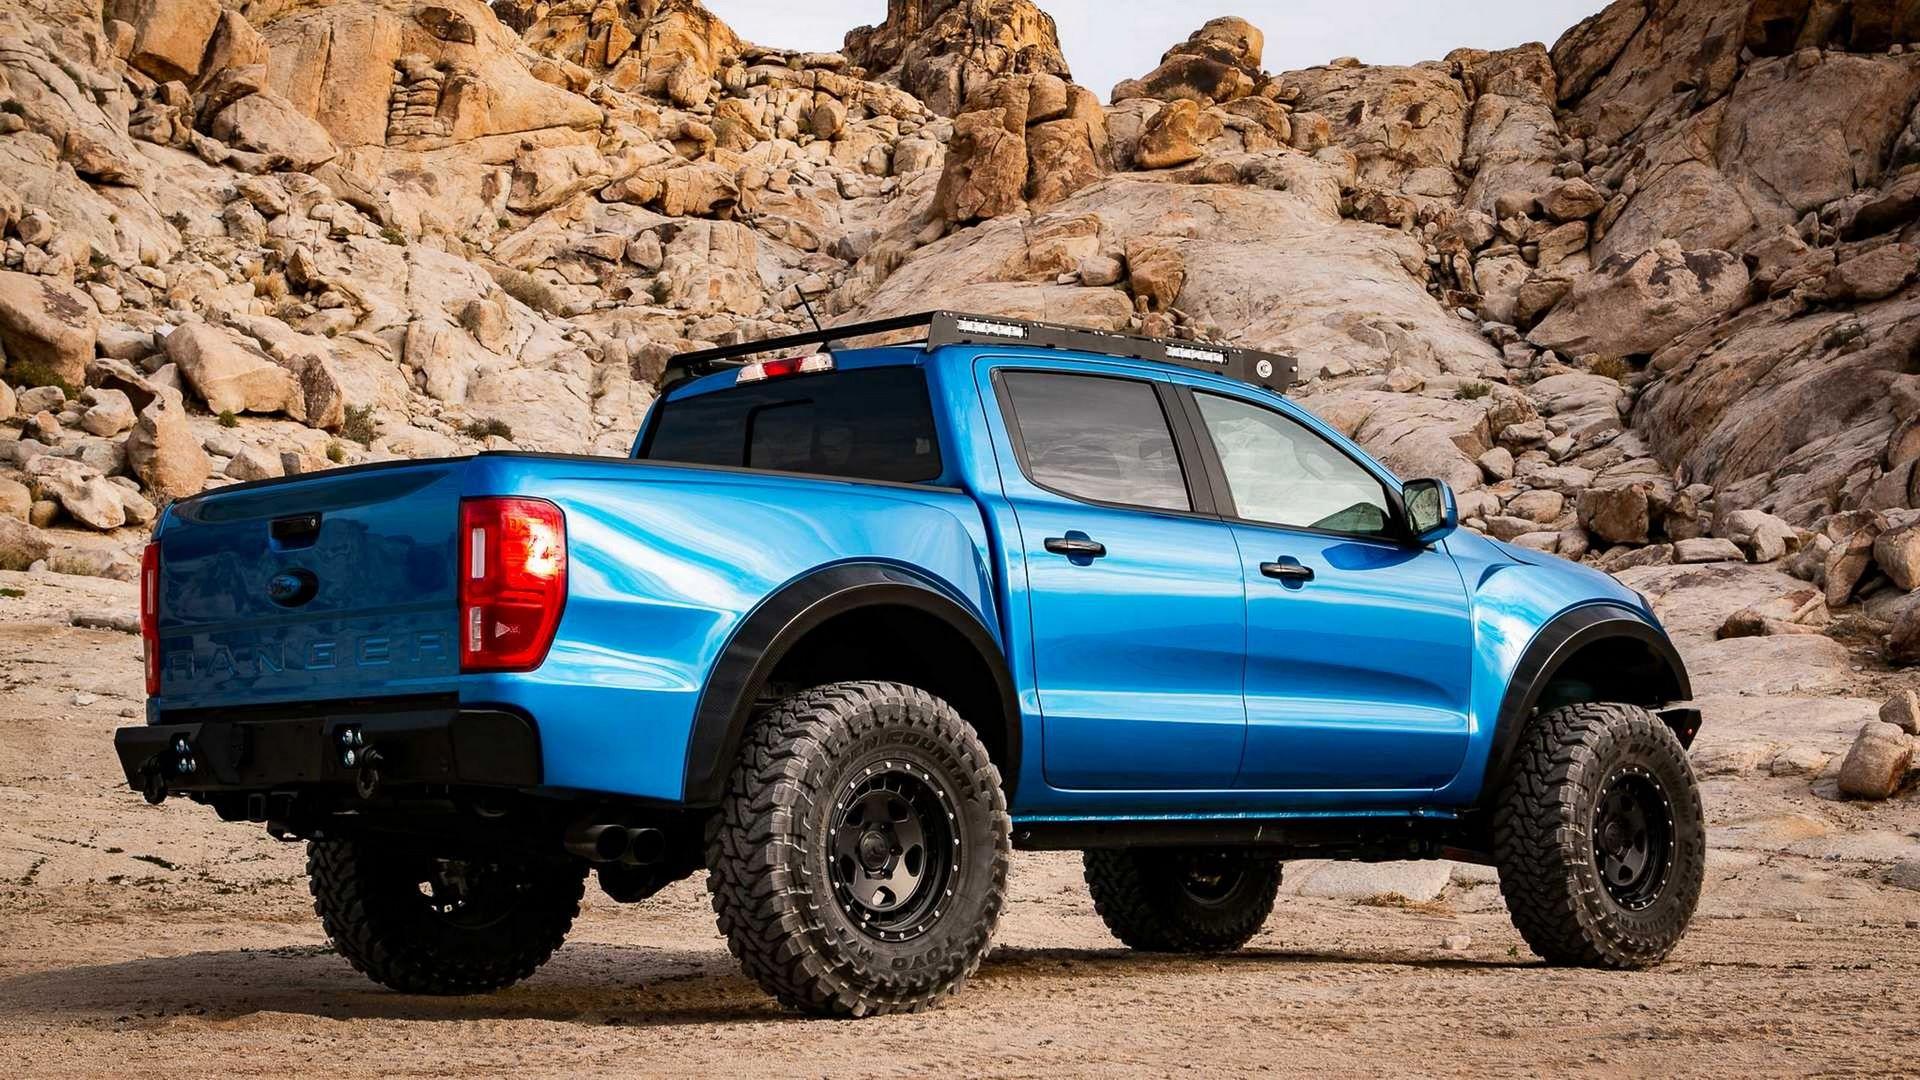 Ford-Ranger-Prorunner-By-APG-20